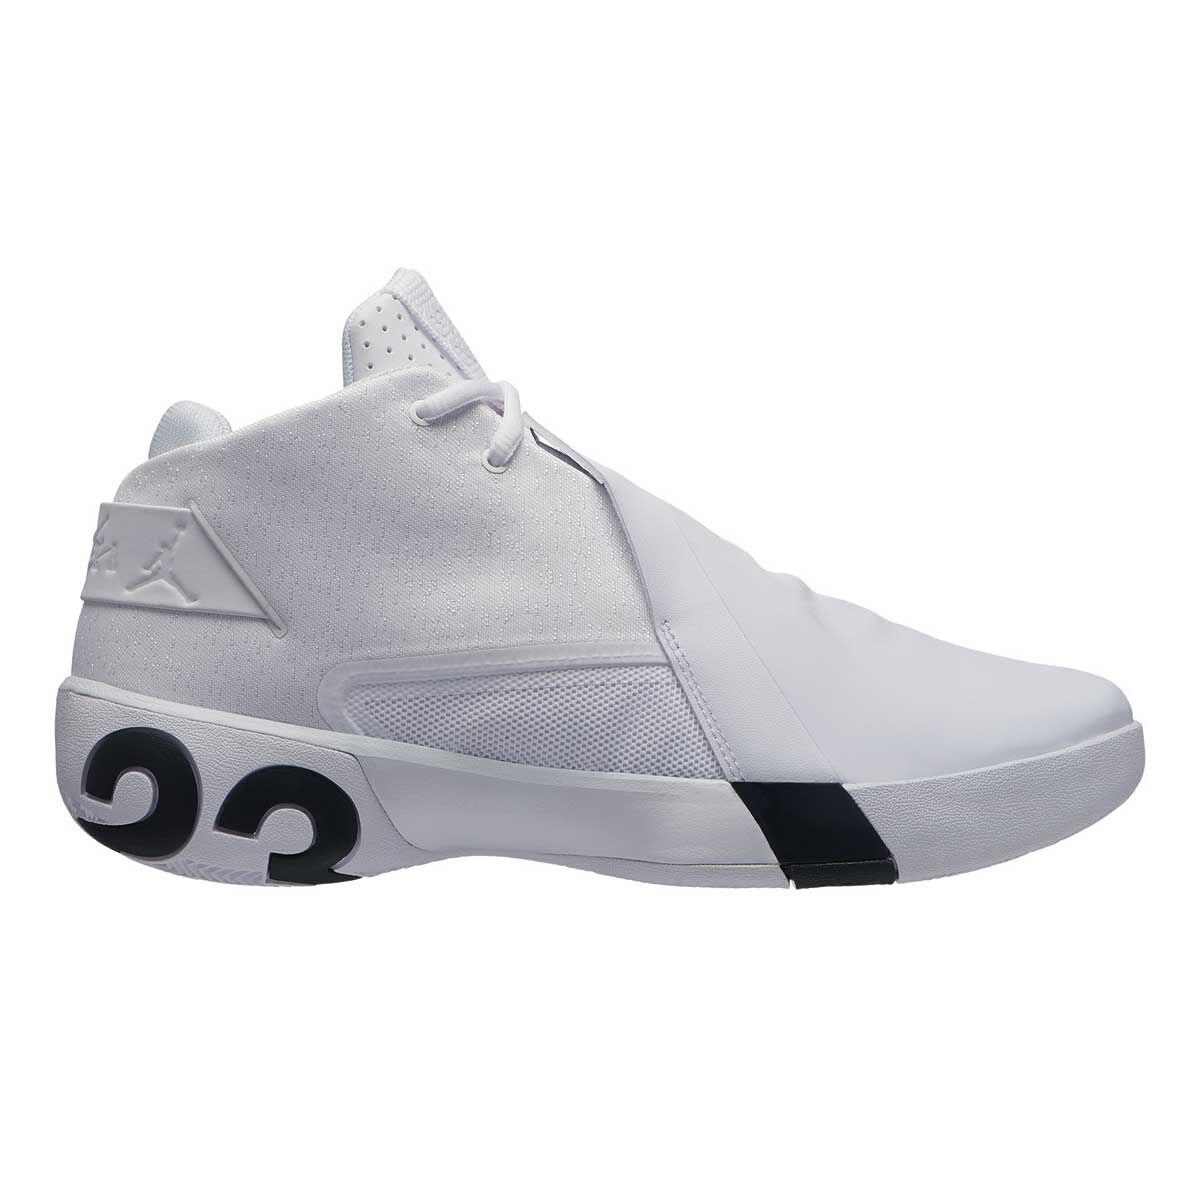 f2f13e09e9f03 ... new arrivals sale. nike jordan ultra fly 3 mens basketball shoe white  black us 7